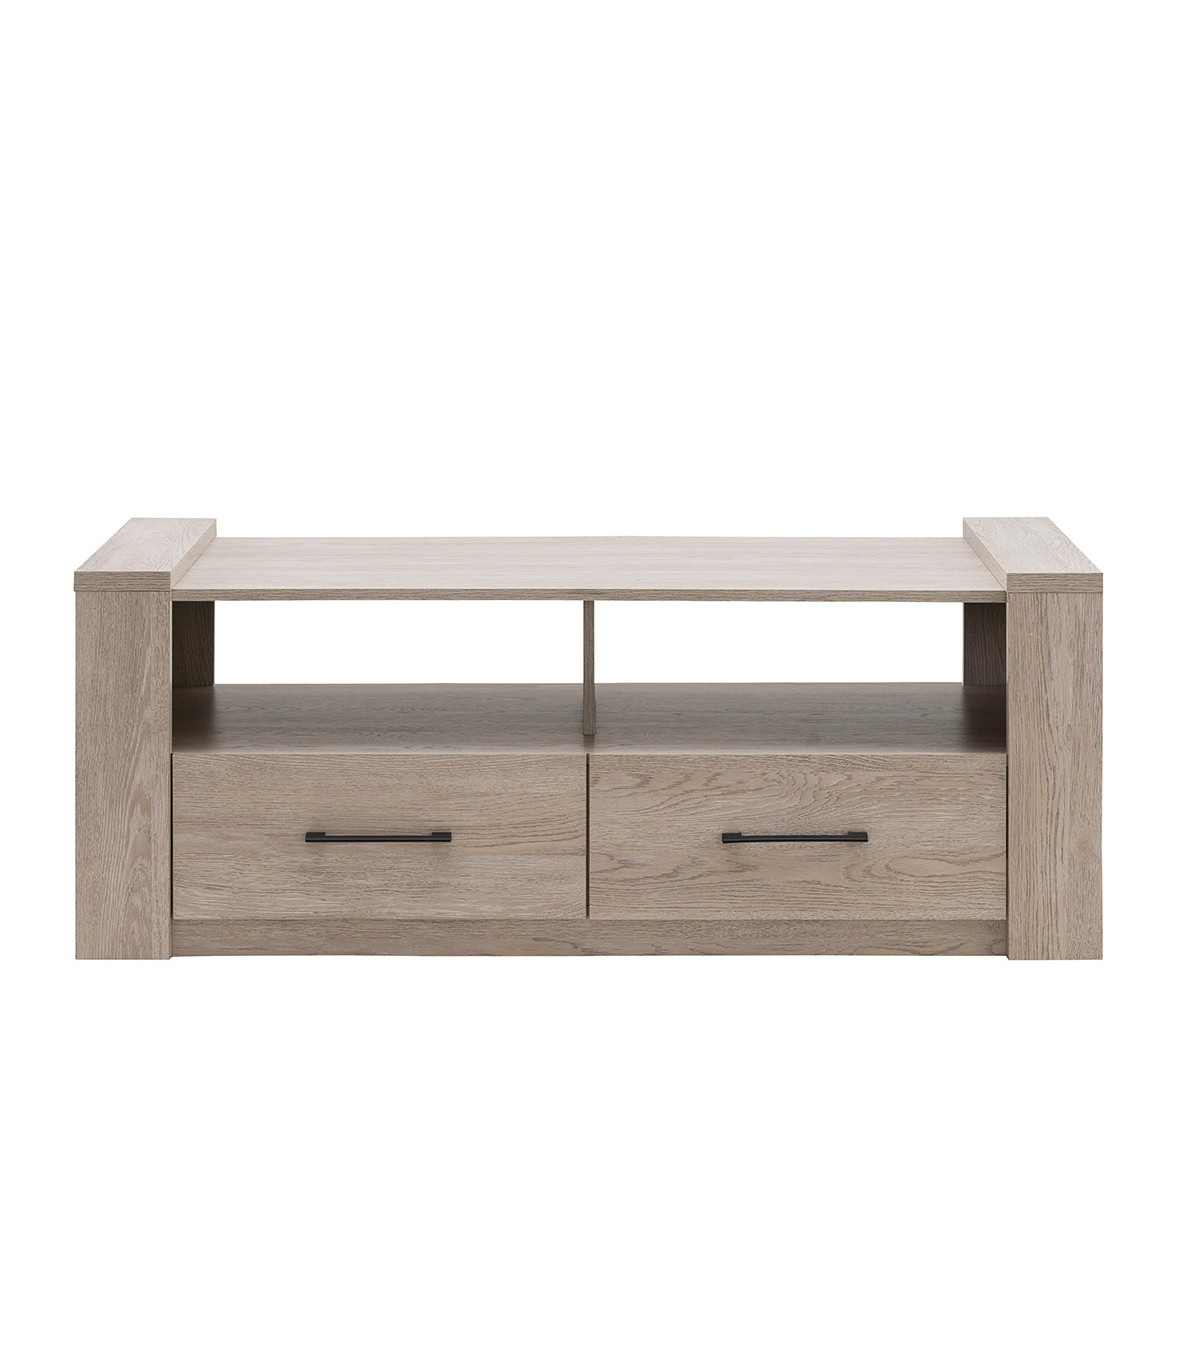 Table basse 2 tiroirs L130cm - Marron